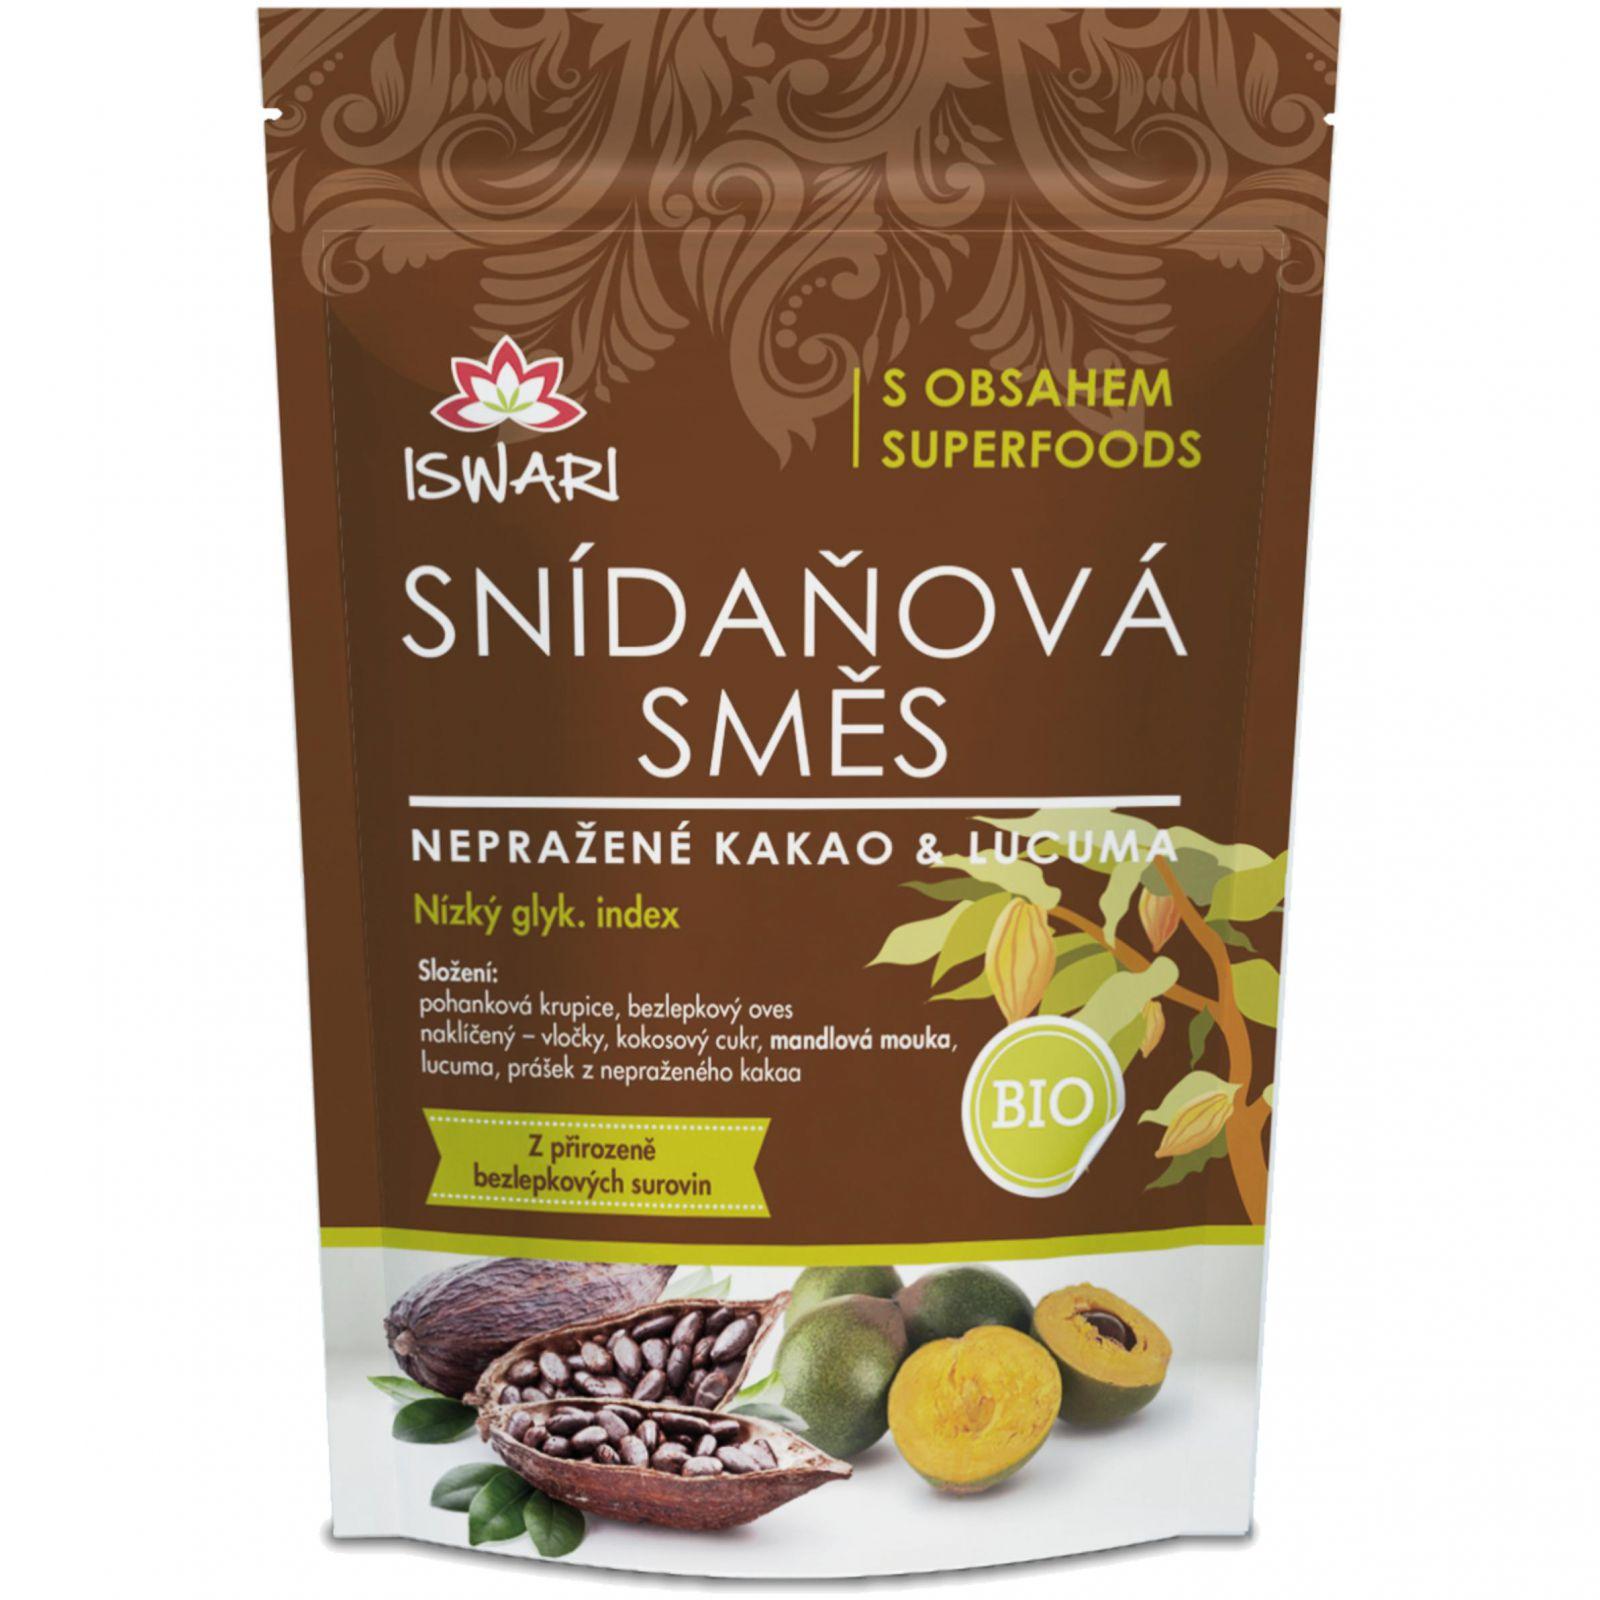 Iswari BIO Snídaňová směs 360 g - nepražené kakao & lucuma